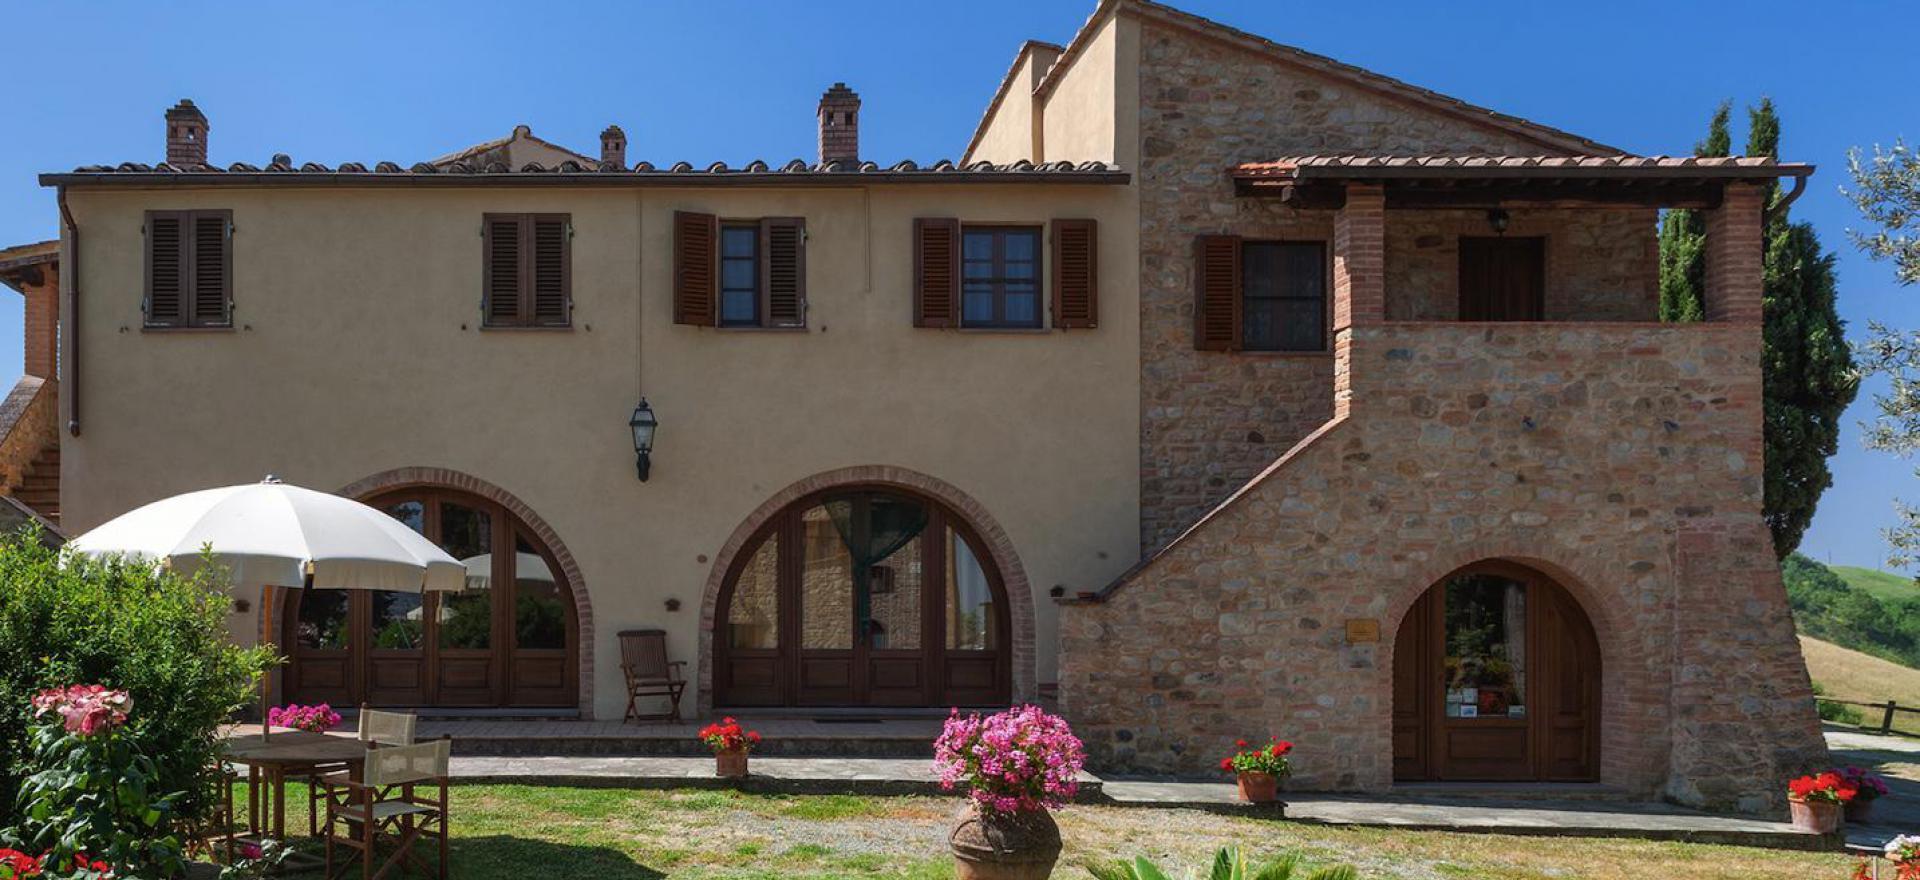 Gastvrije agriturismo in Toscane waar la mamma kookt